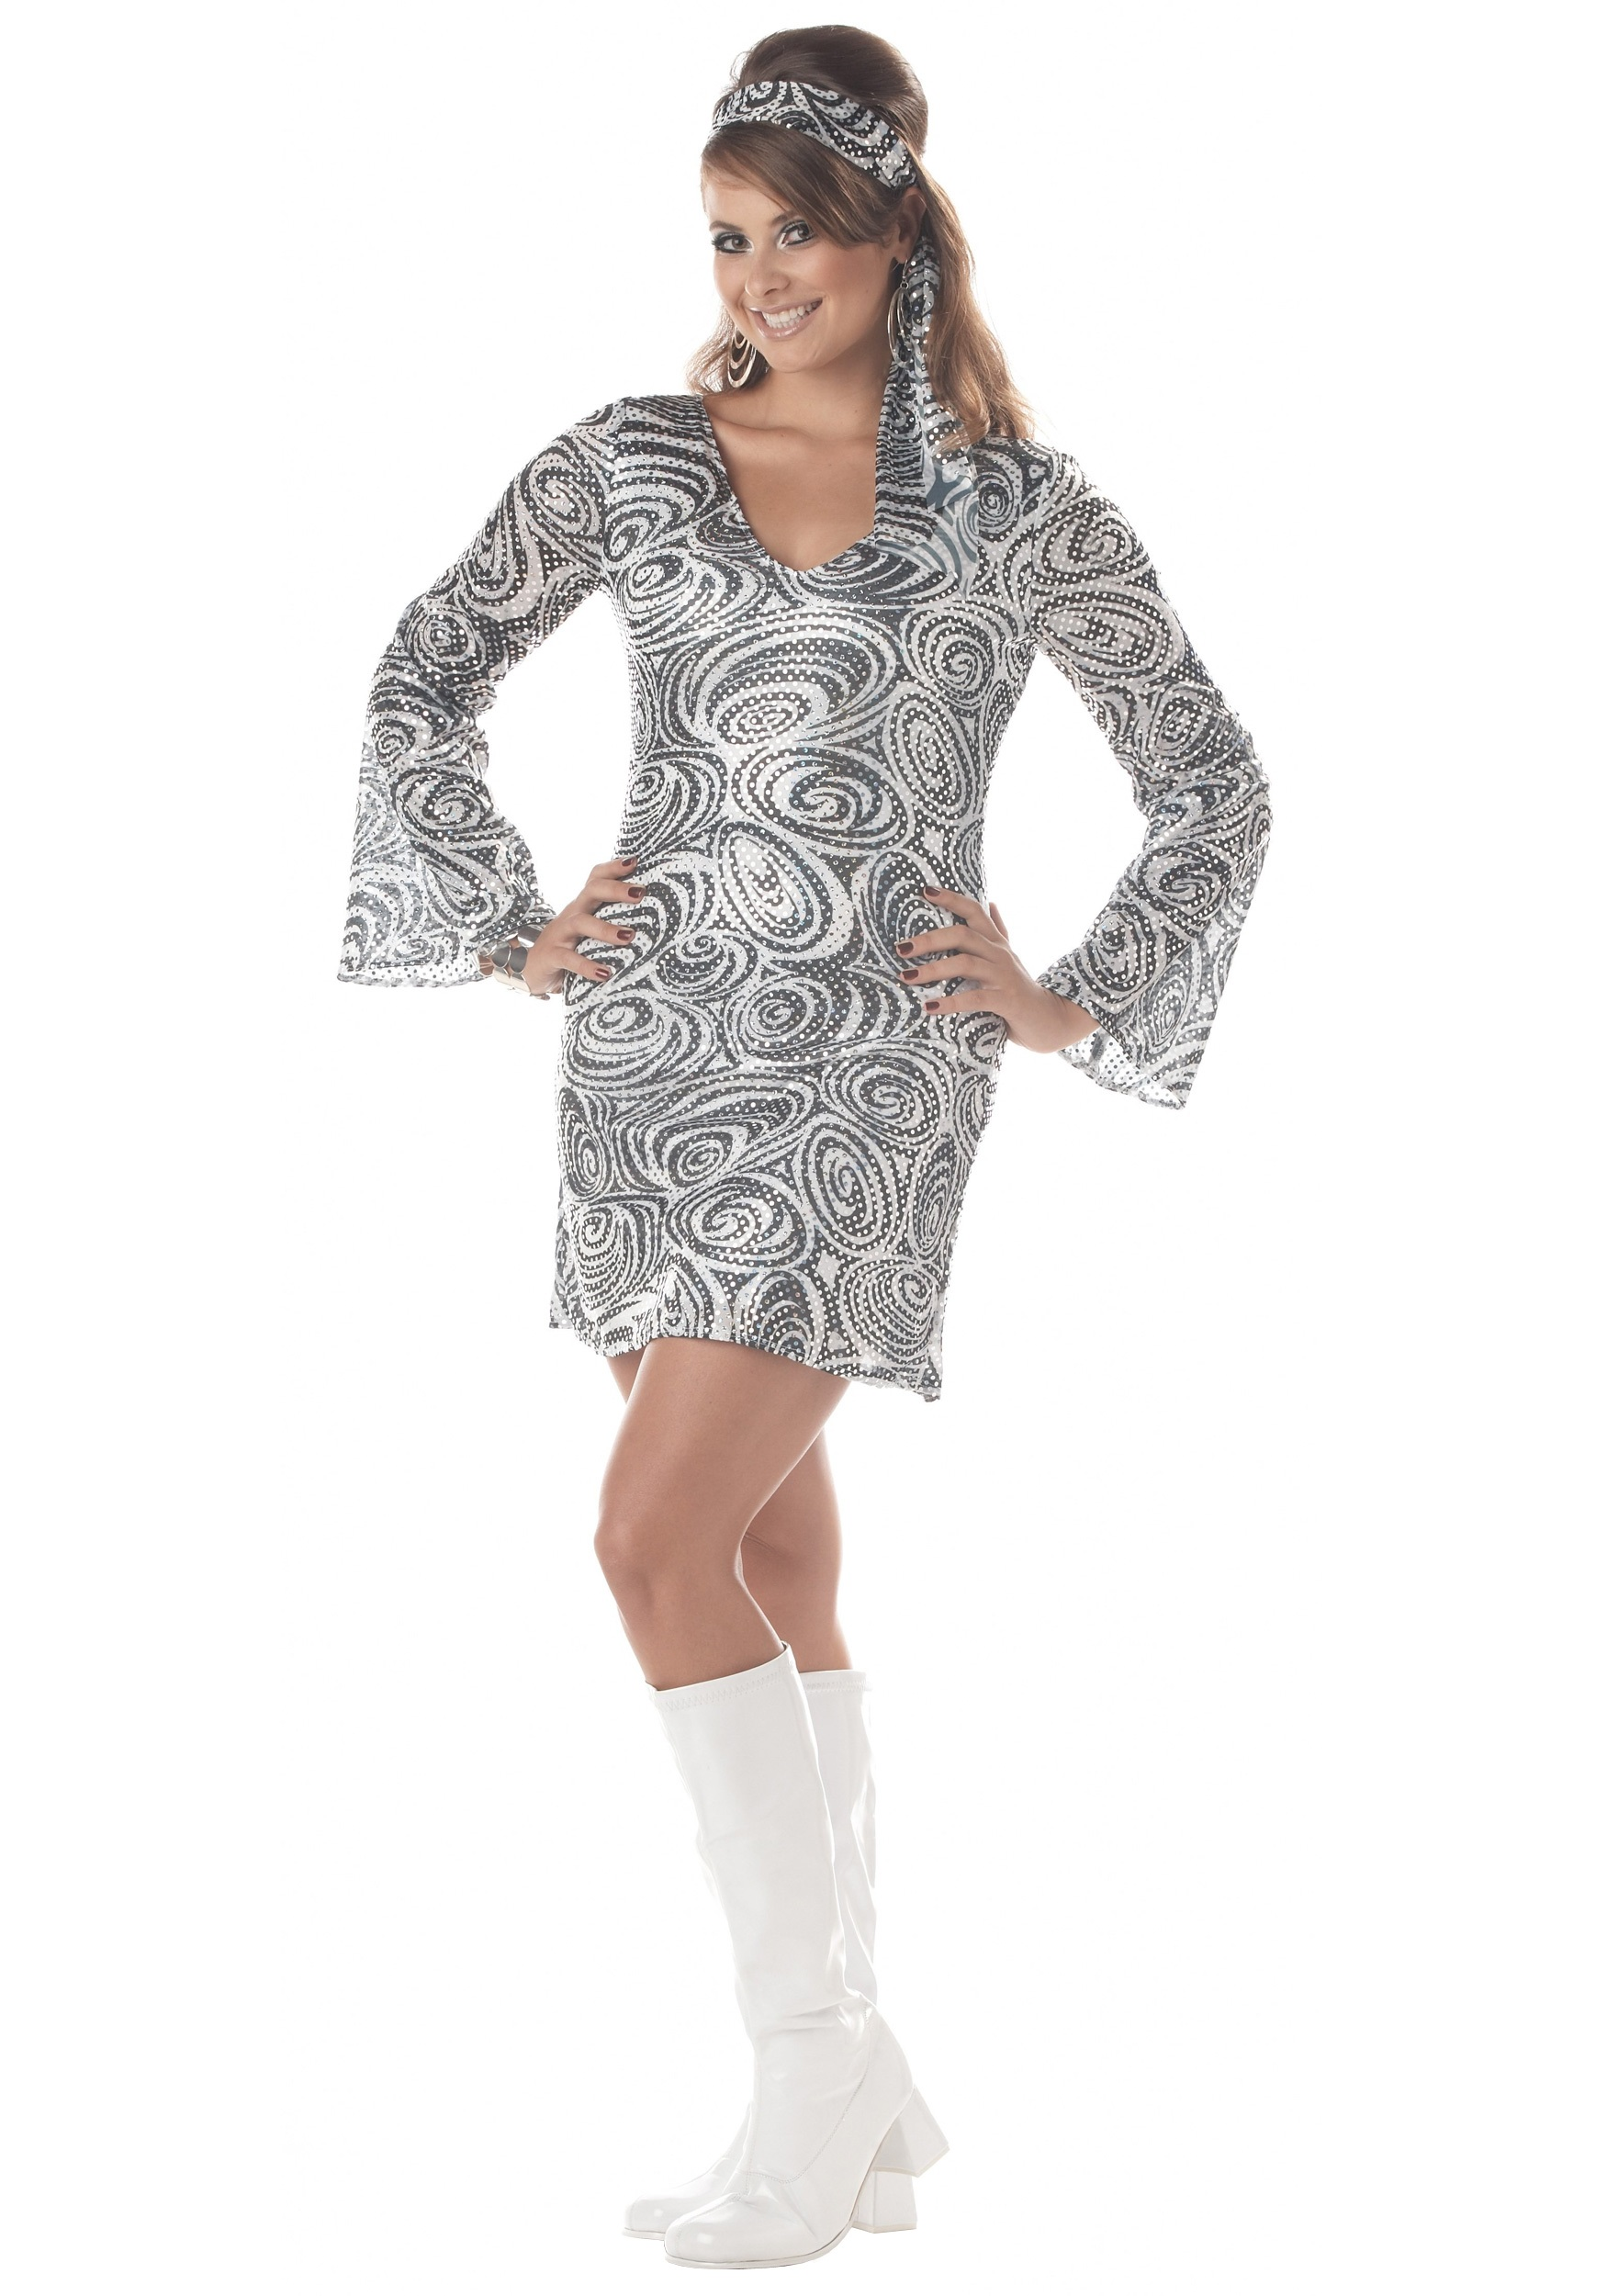 Women\'s Disco Diva Plus Size Dress Costume